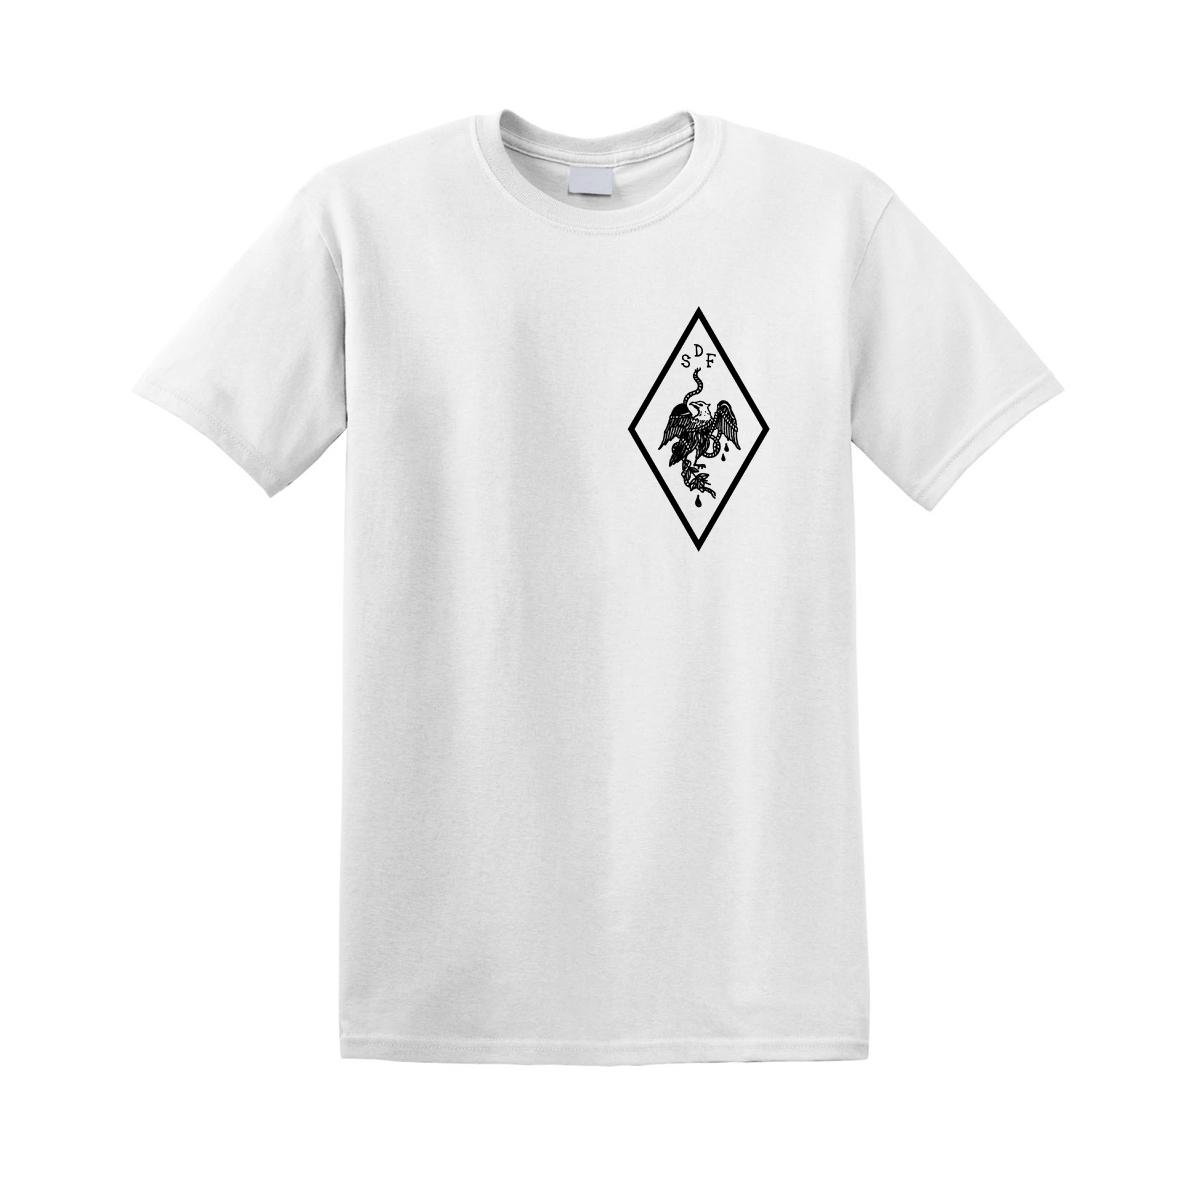 Self Defense Family - Merchandise